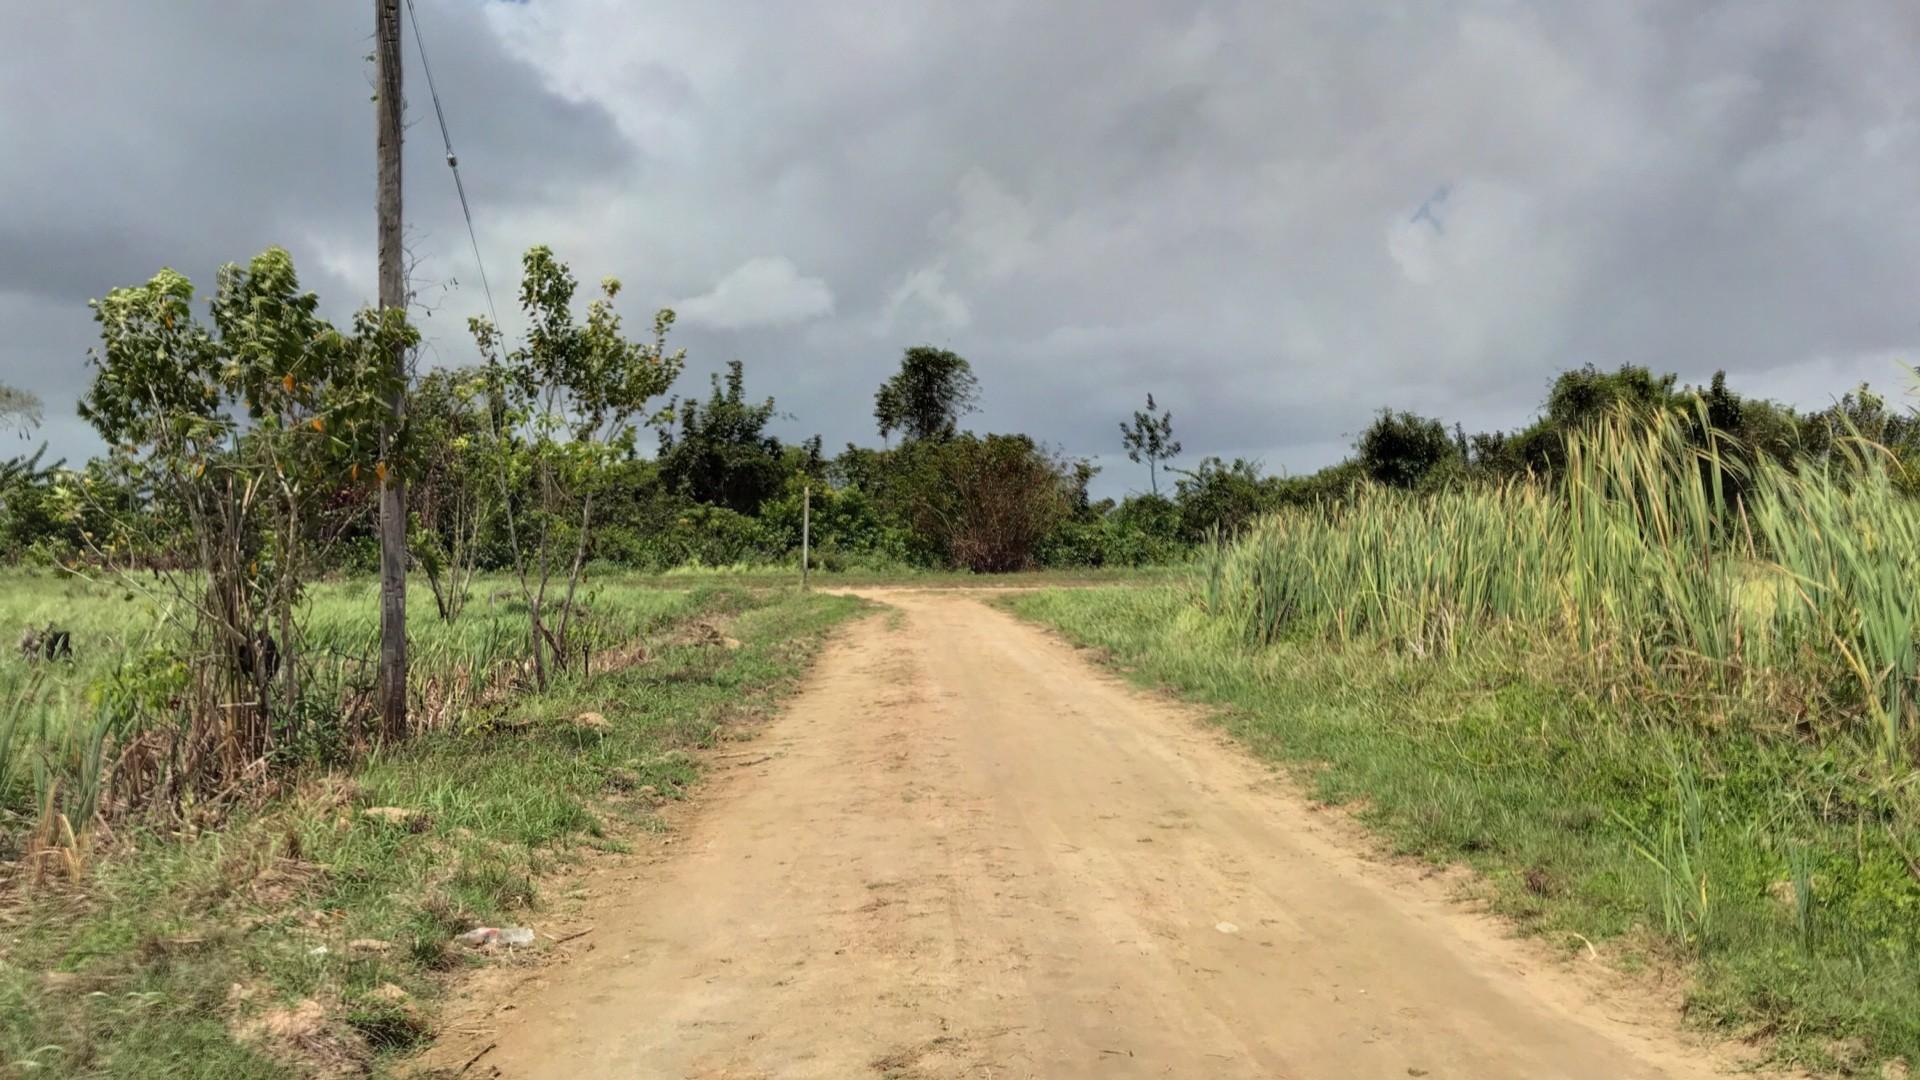 Masoemanweg - Prachtige bouwkavel te Lust en Rust in de aanbieding - Surgoed Makelaardij NV - Paramaribo, Suriname